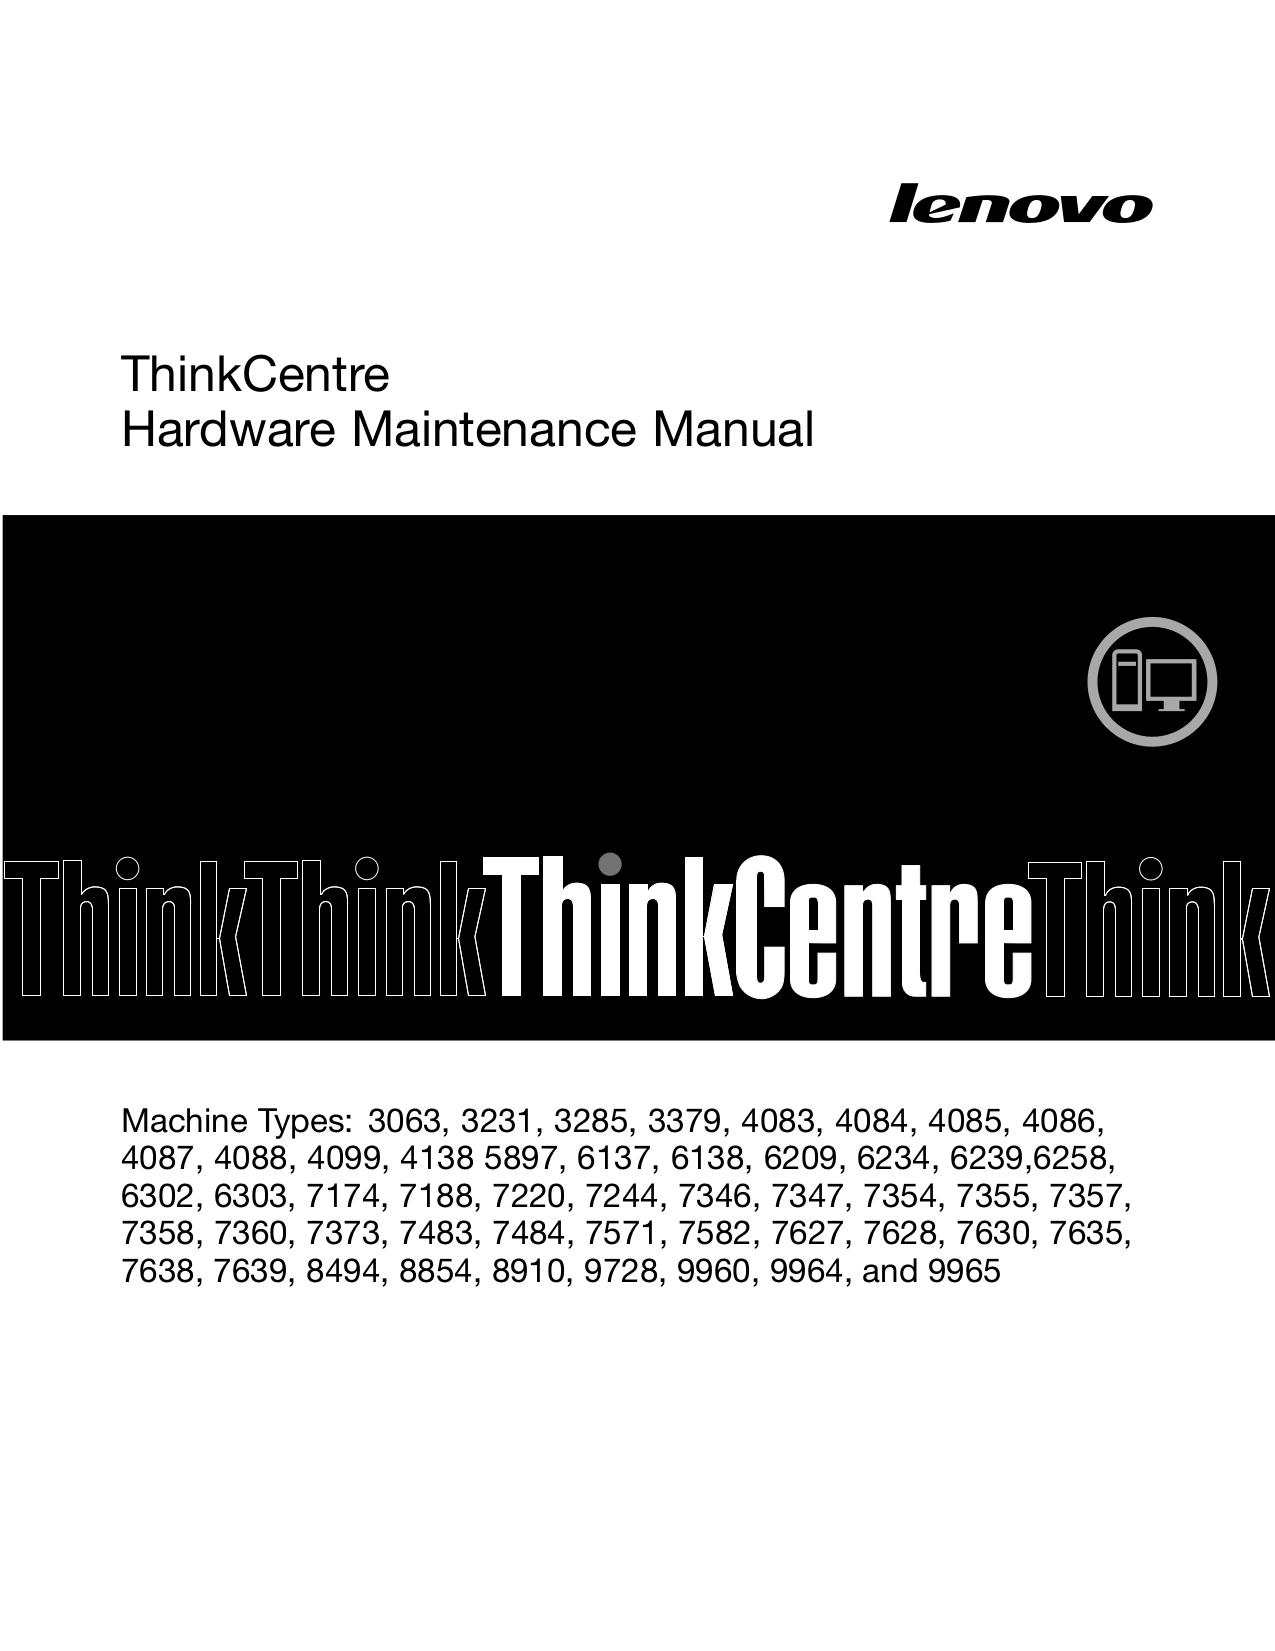 pdf for Lenovo Desktop ThinkCentre M58 7354 manual